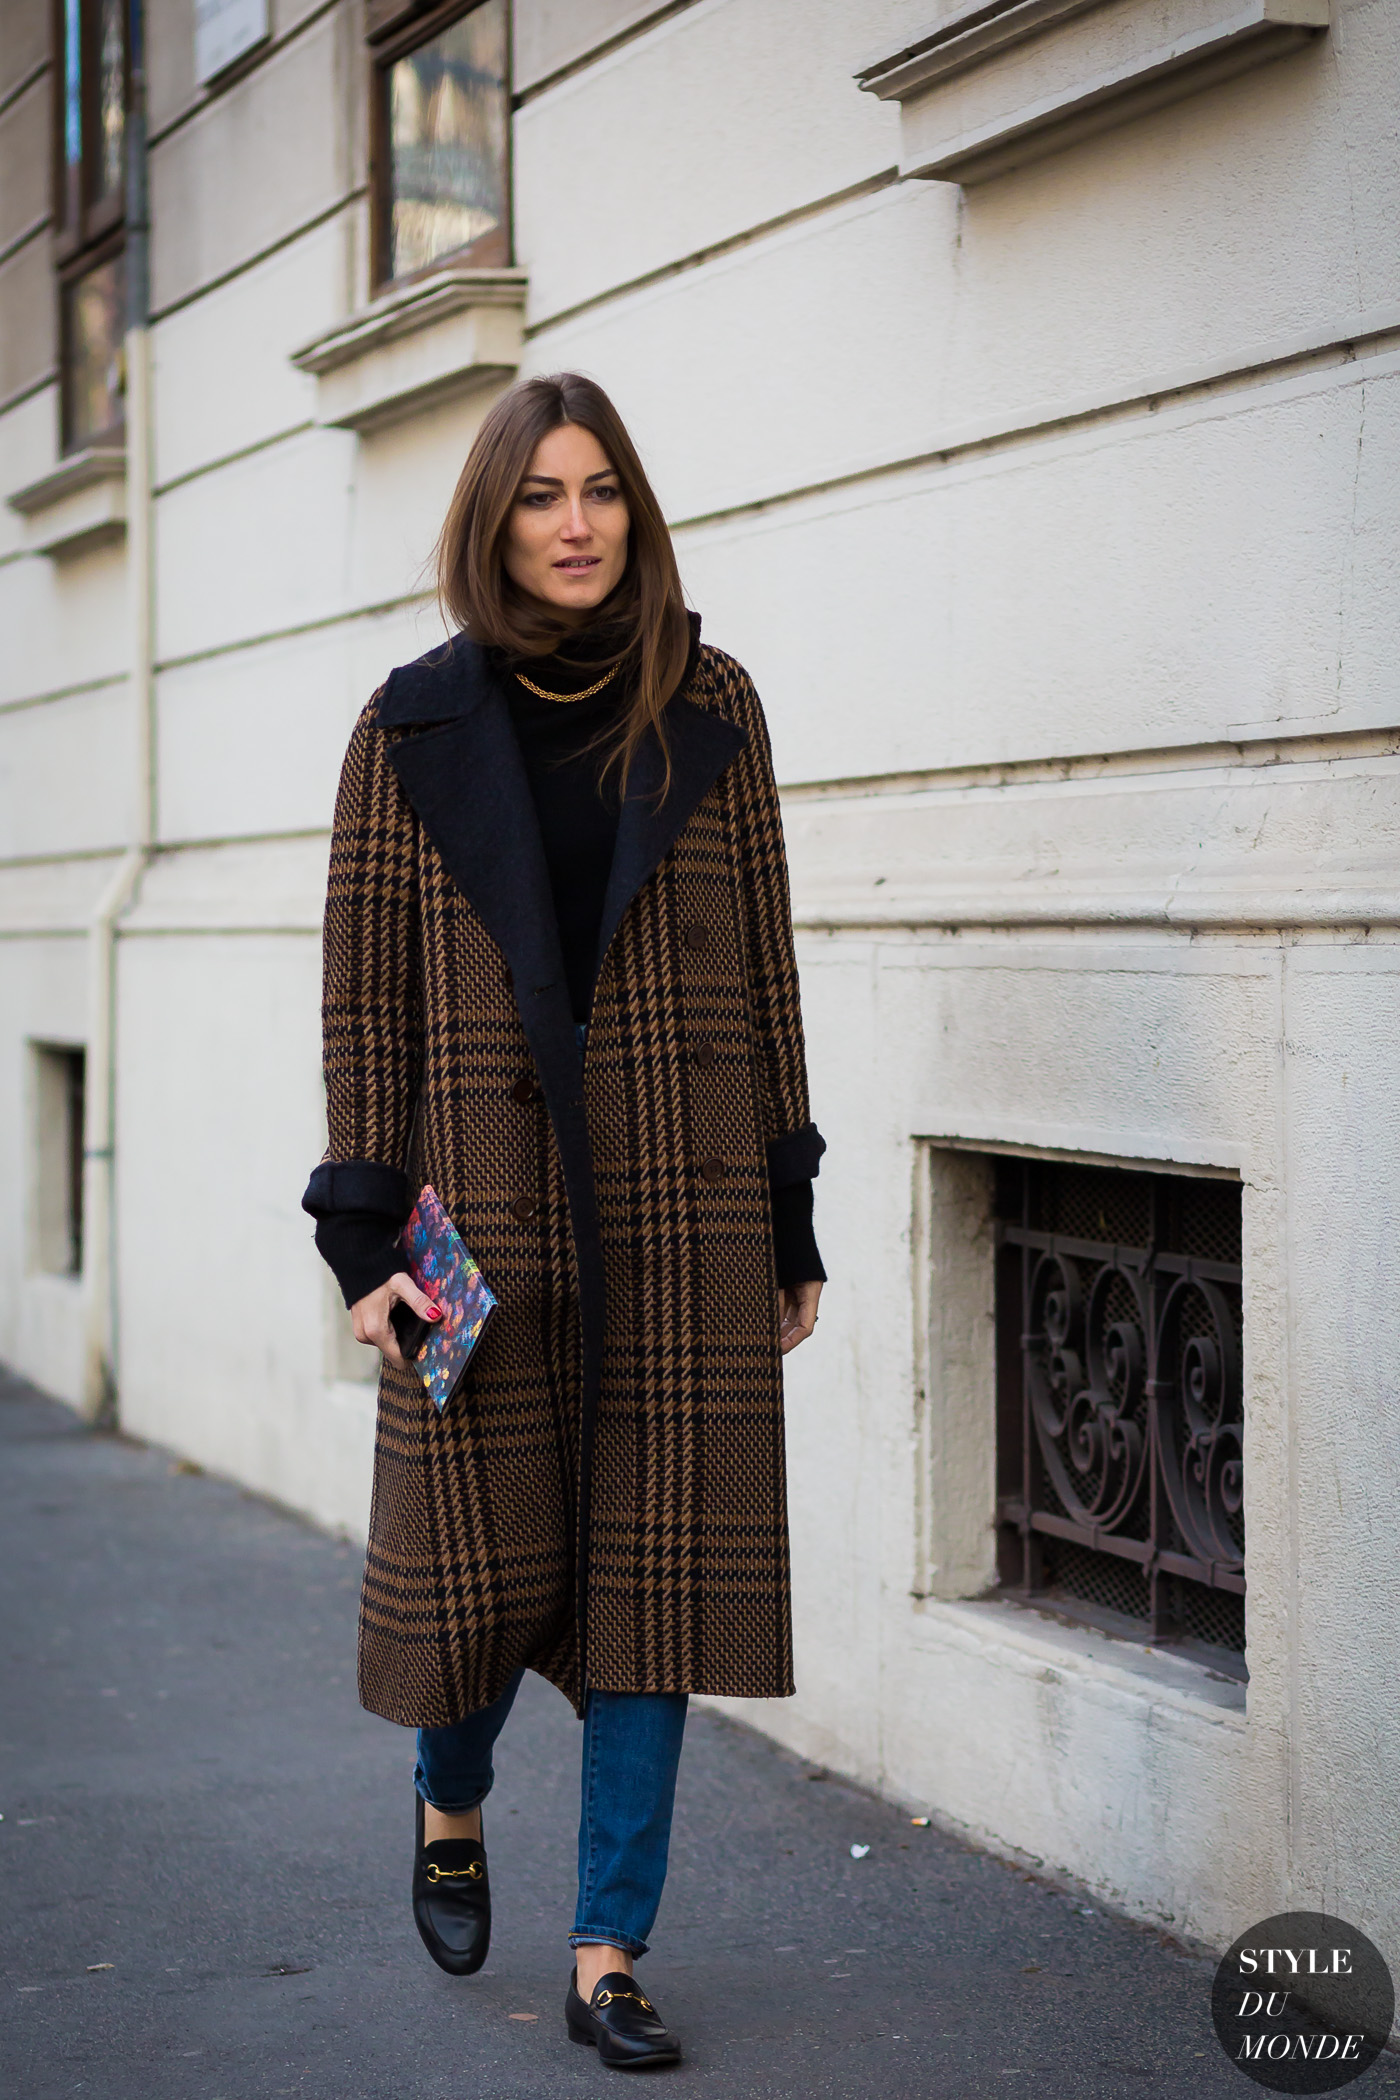 Giorgia-Tordini-by-STYLEDUMONDE-Street-Style-Fashion-Photography0E2A3073.jpg